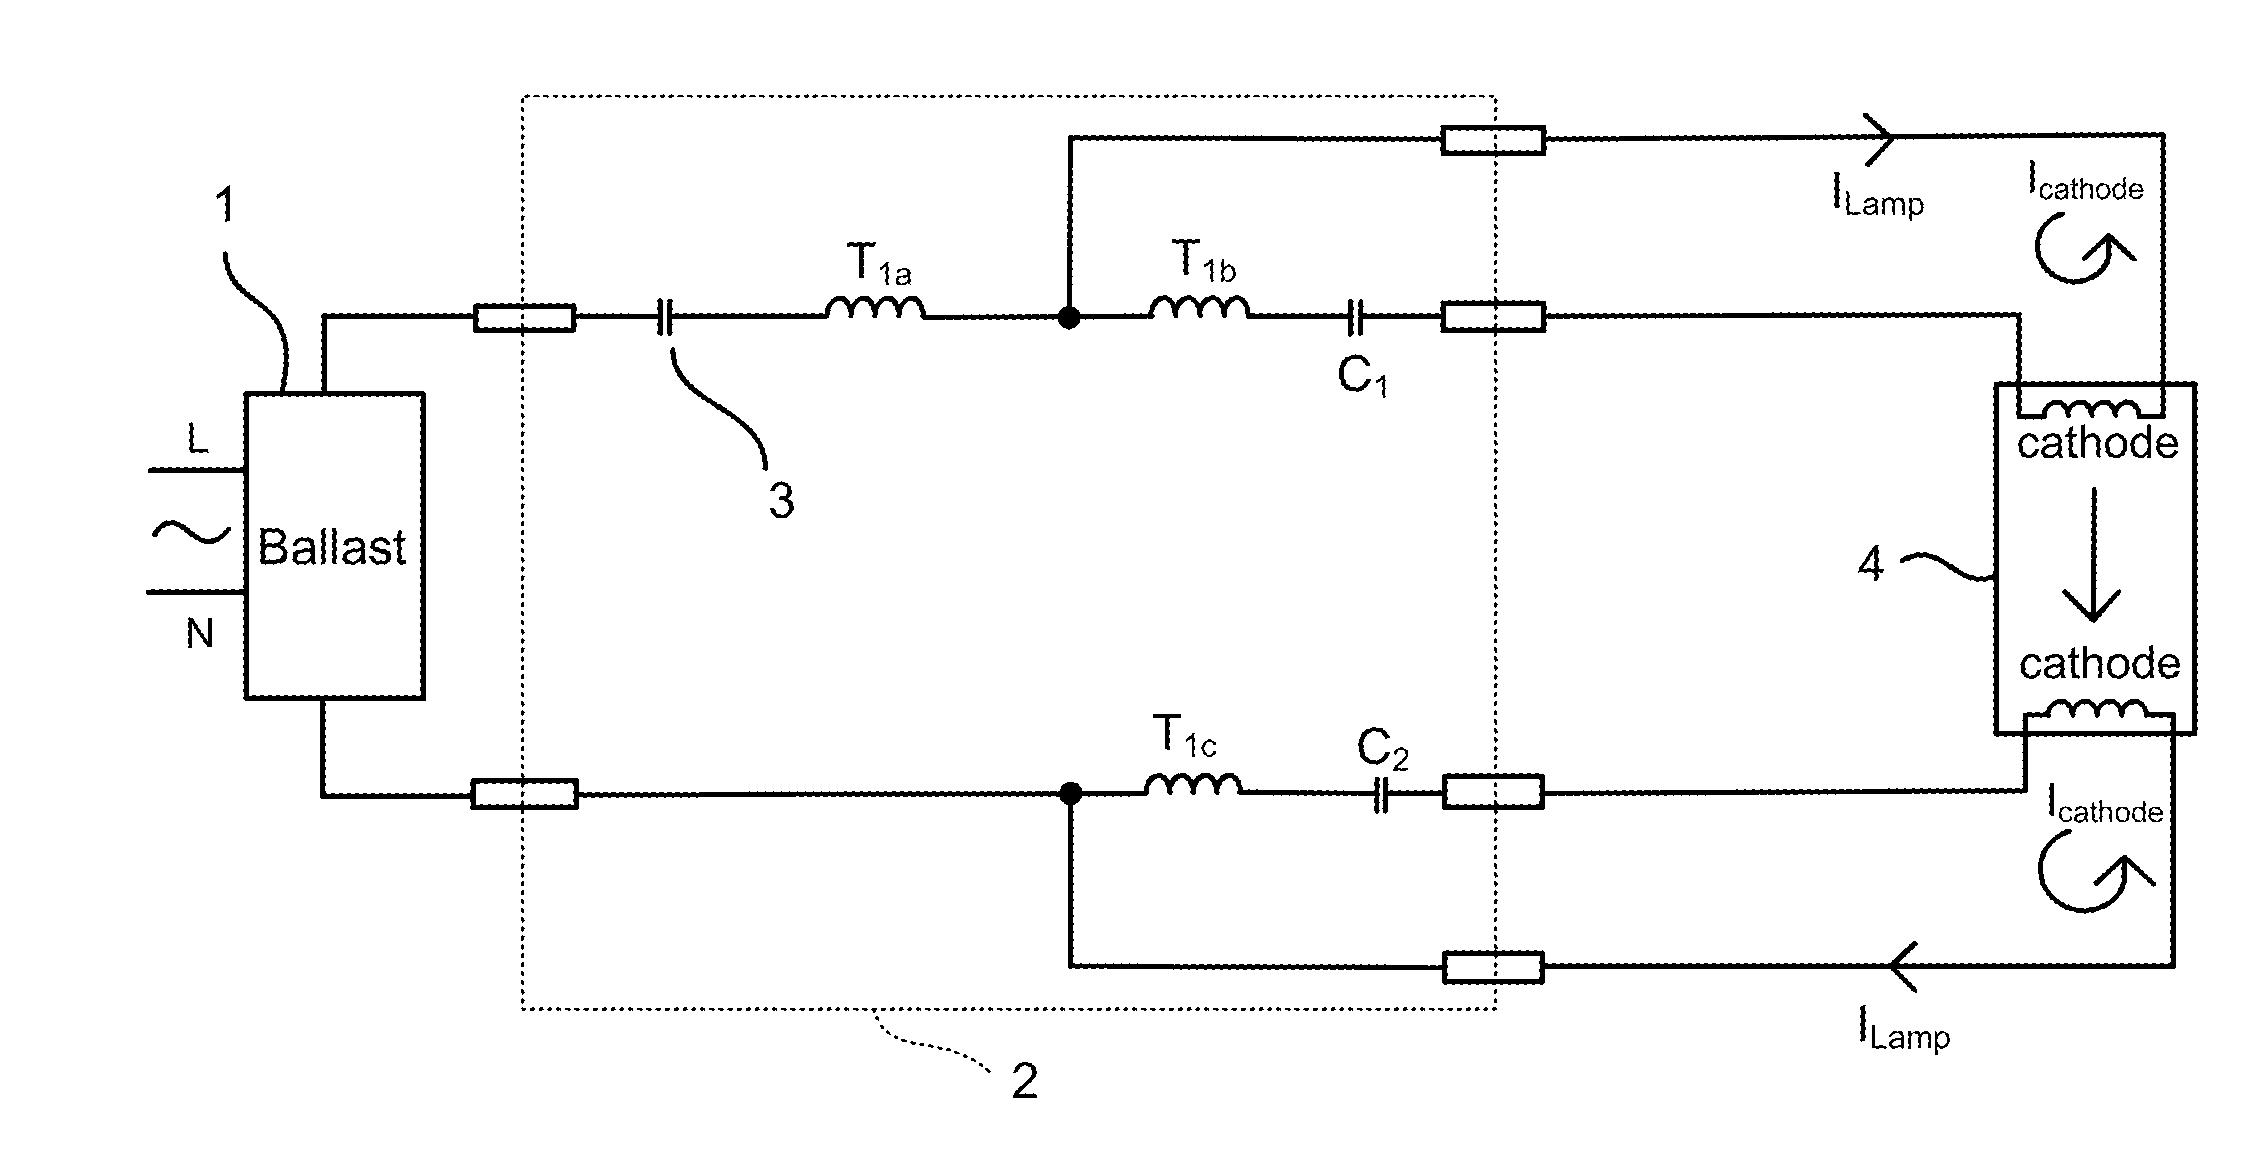 wiring diagram of fluorescent lamp capacitor wiring wiring diagram of fluorescent lamp capacitor wiring diagram on wiring diagram of fluorescent lamp